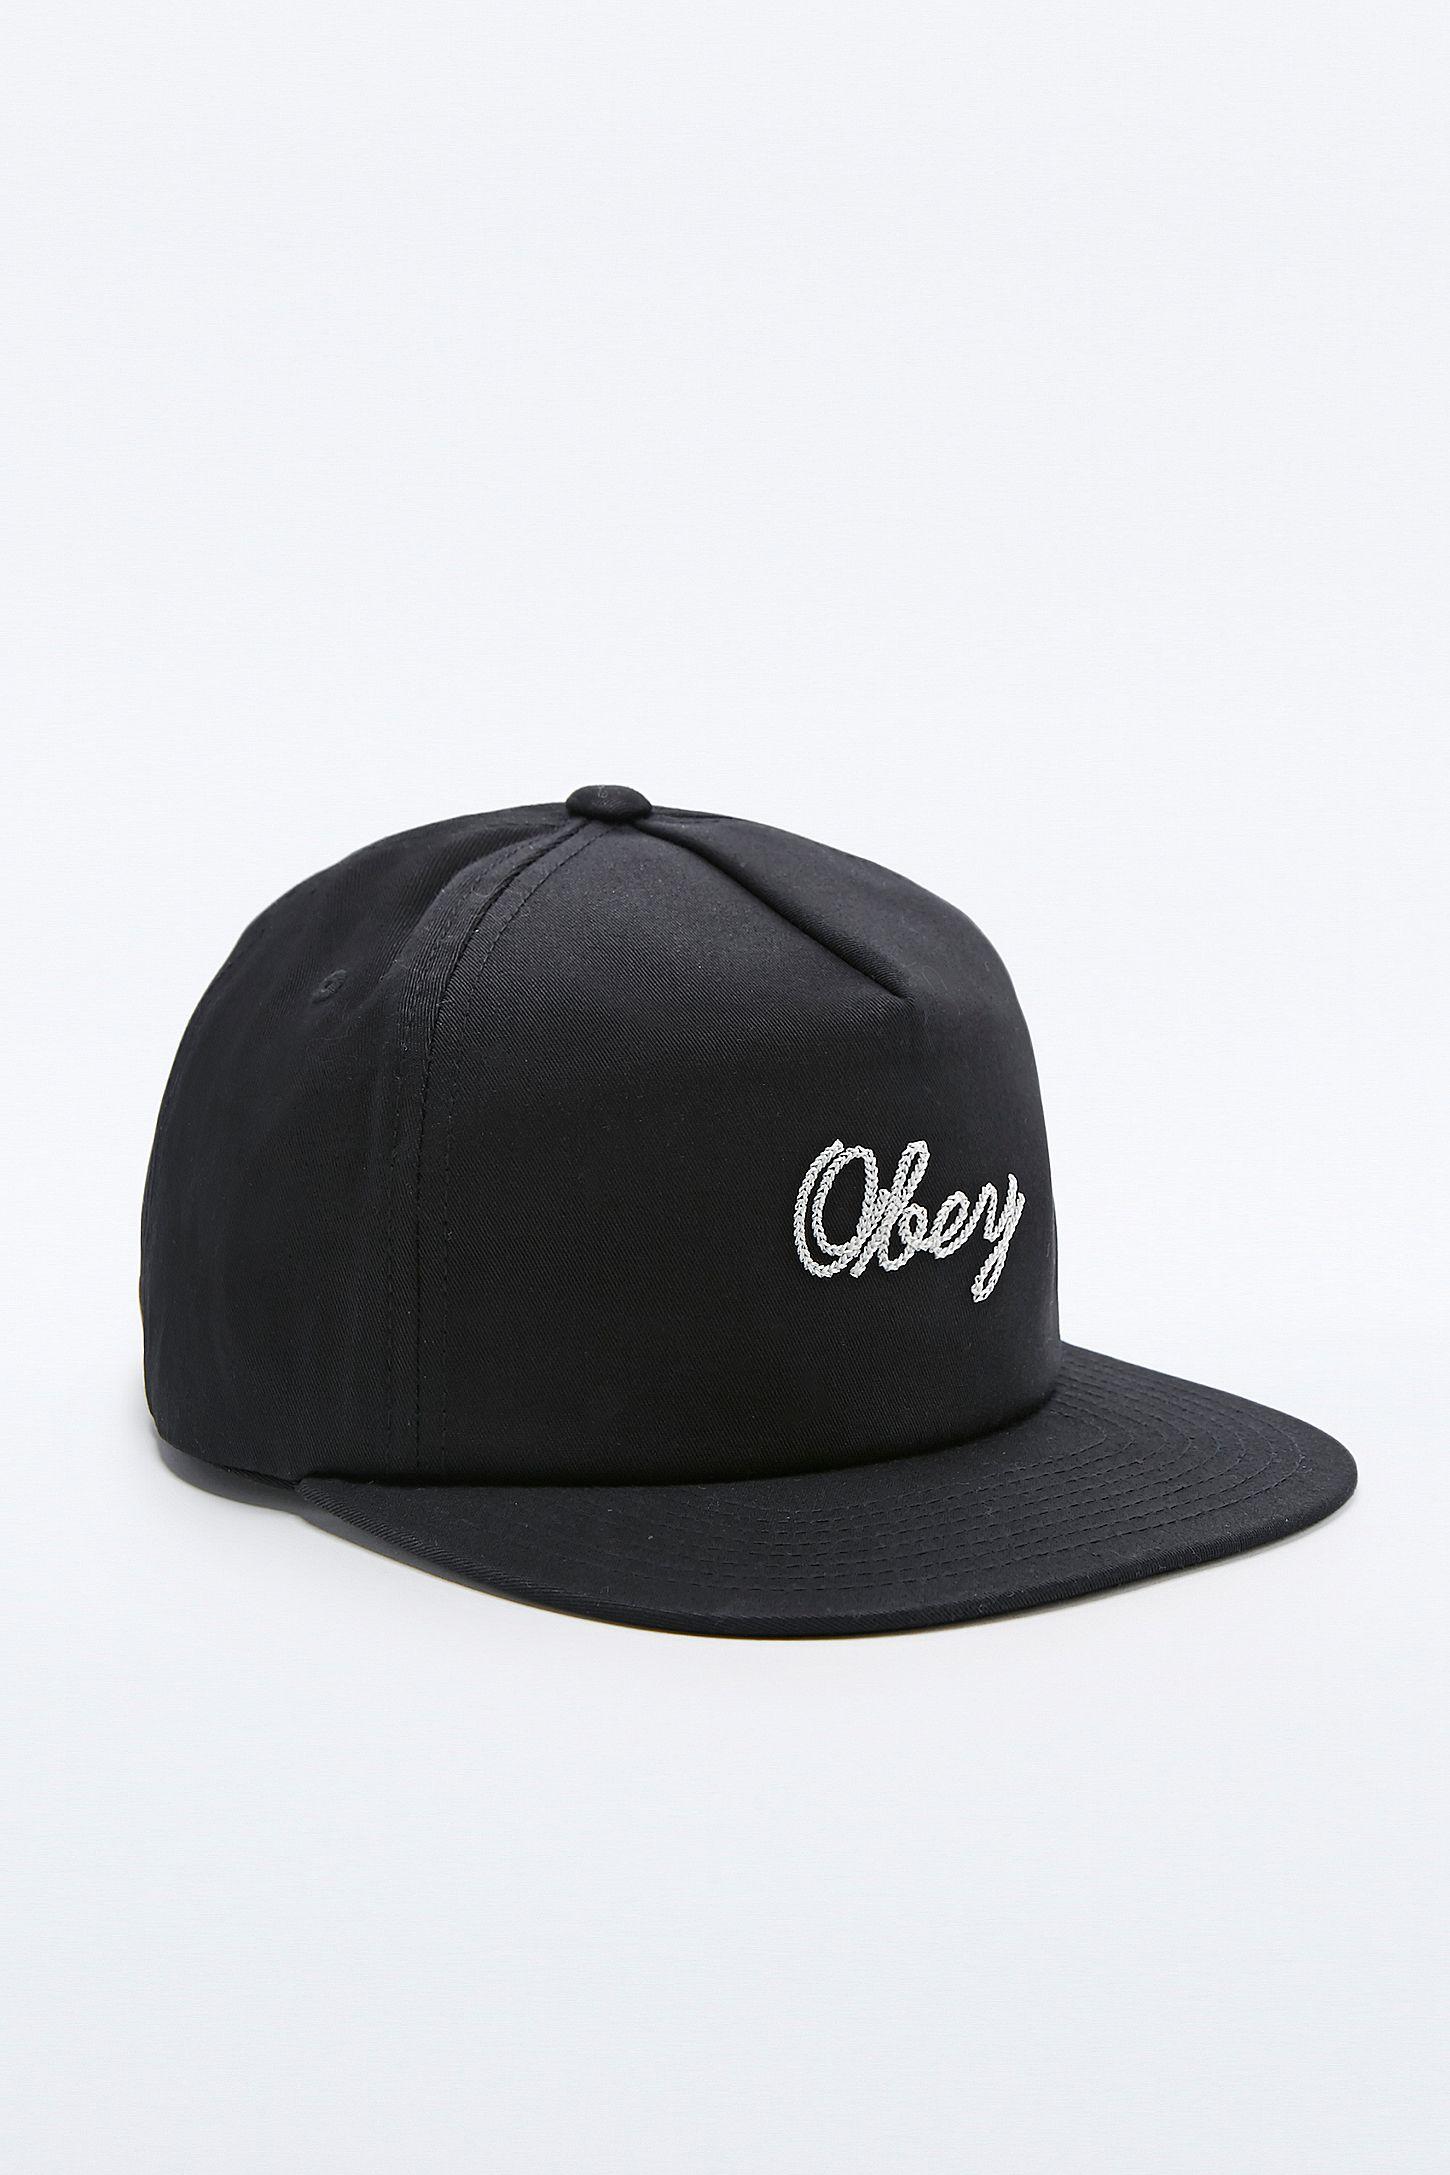 88c821c46fe3a Obey Euclid Snapback Cap in Black